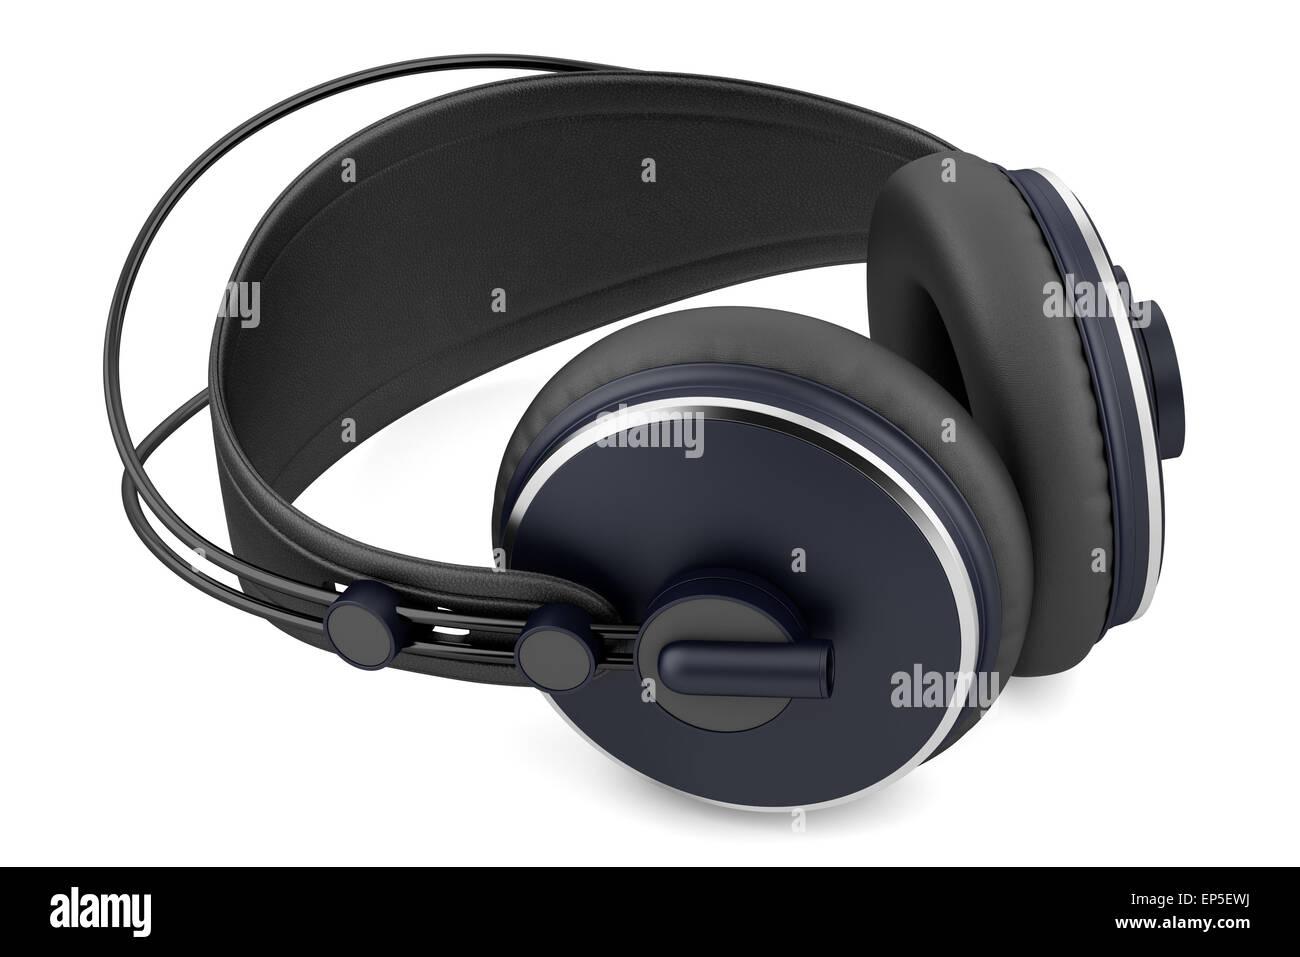 black wireless headphones isolated on white - Stock Image